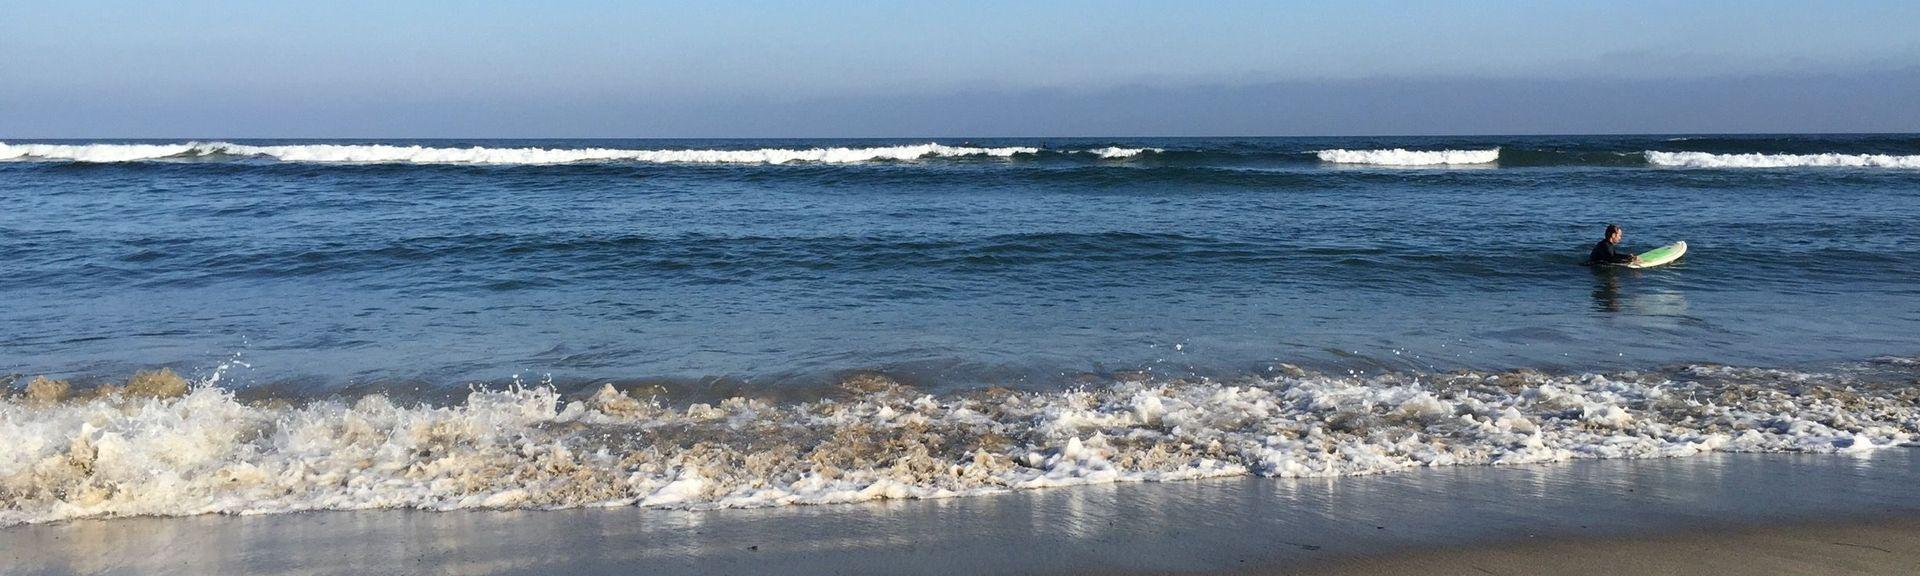 Malibu Lagoon State Beach (Strand), Malibu, Kalifornien, USA